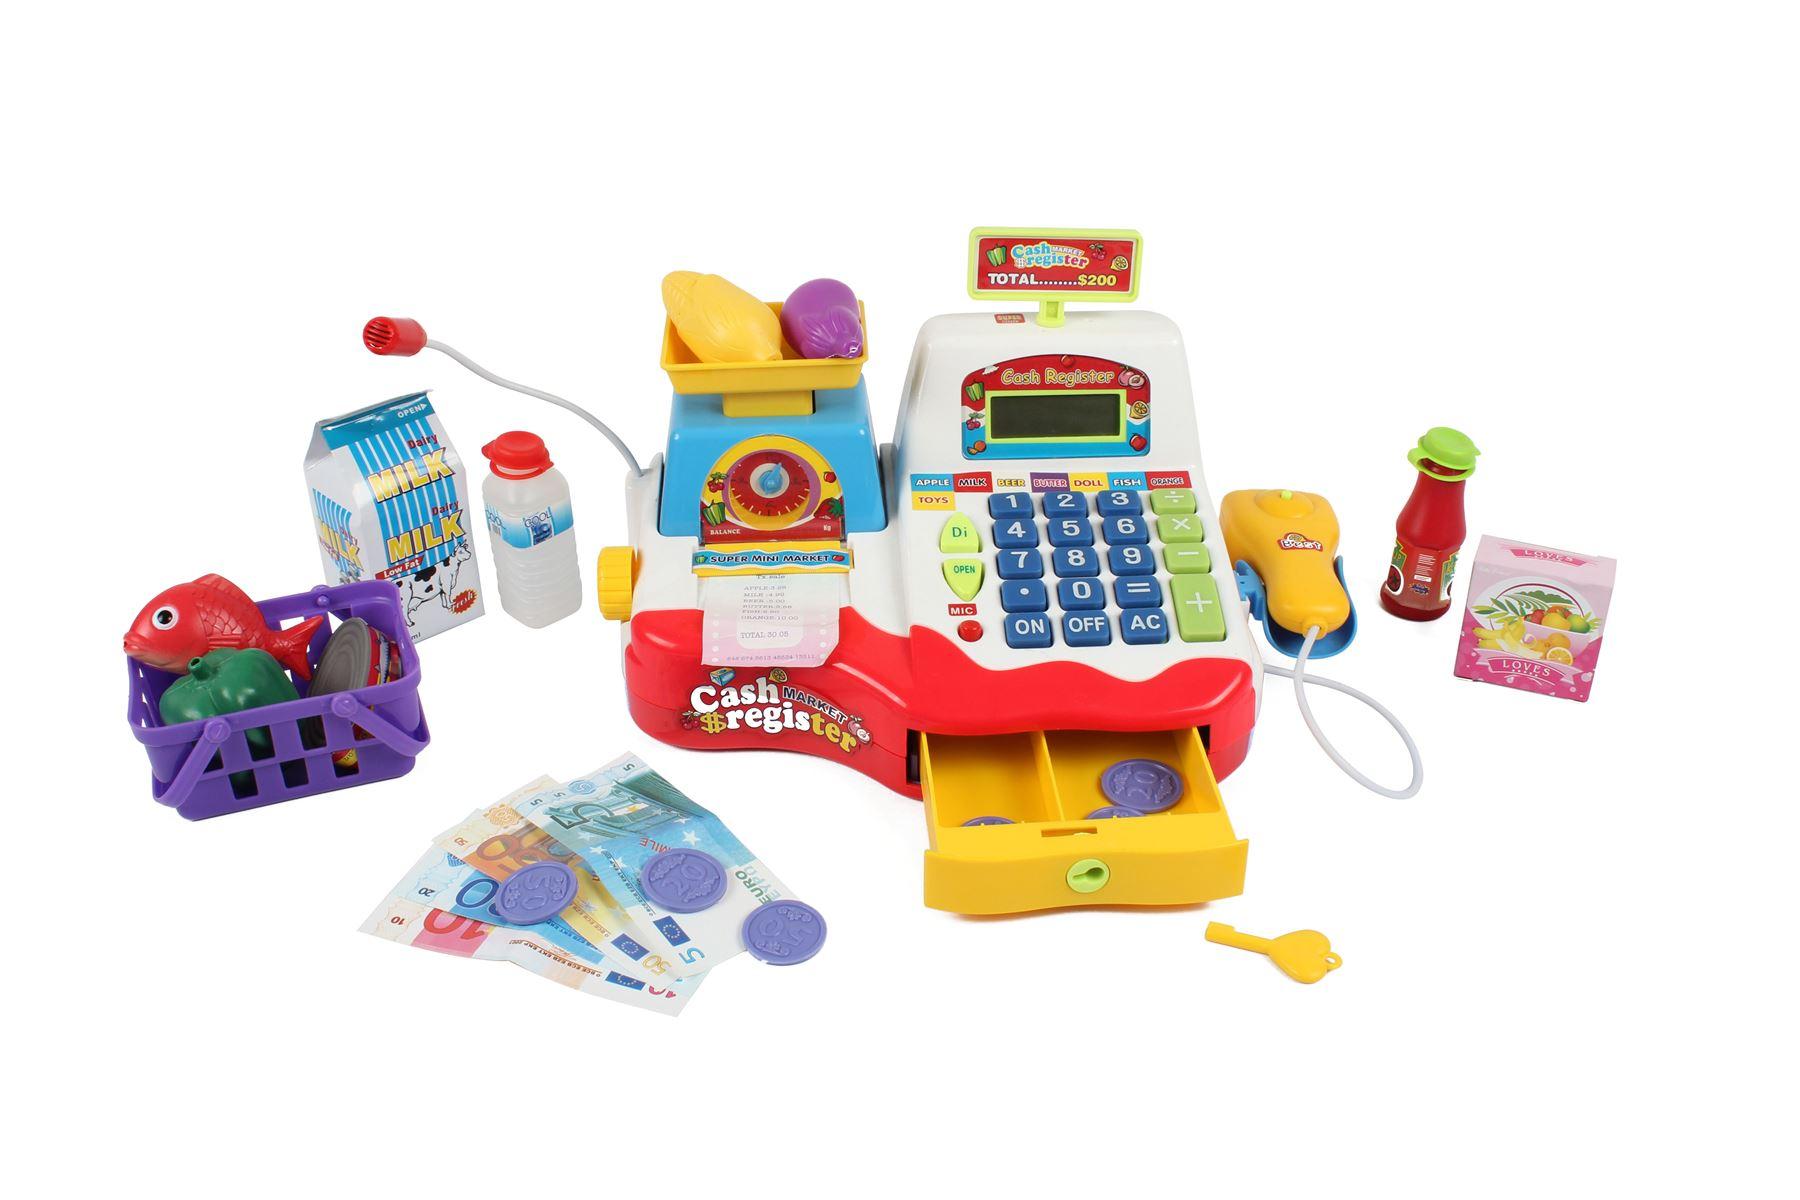 Childrens Kids Supermarket Cash Register Pretend Play Shop Grocery